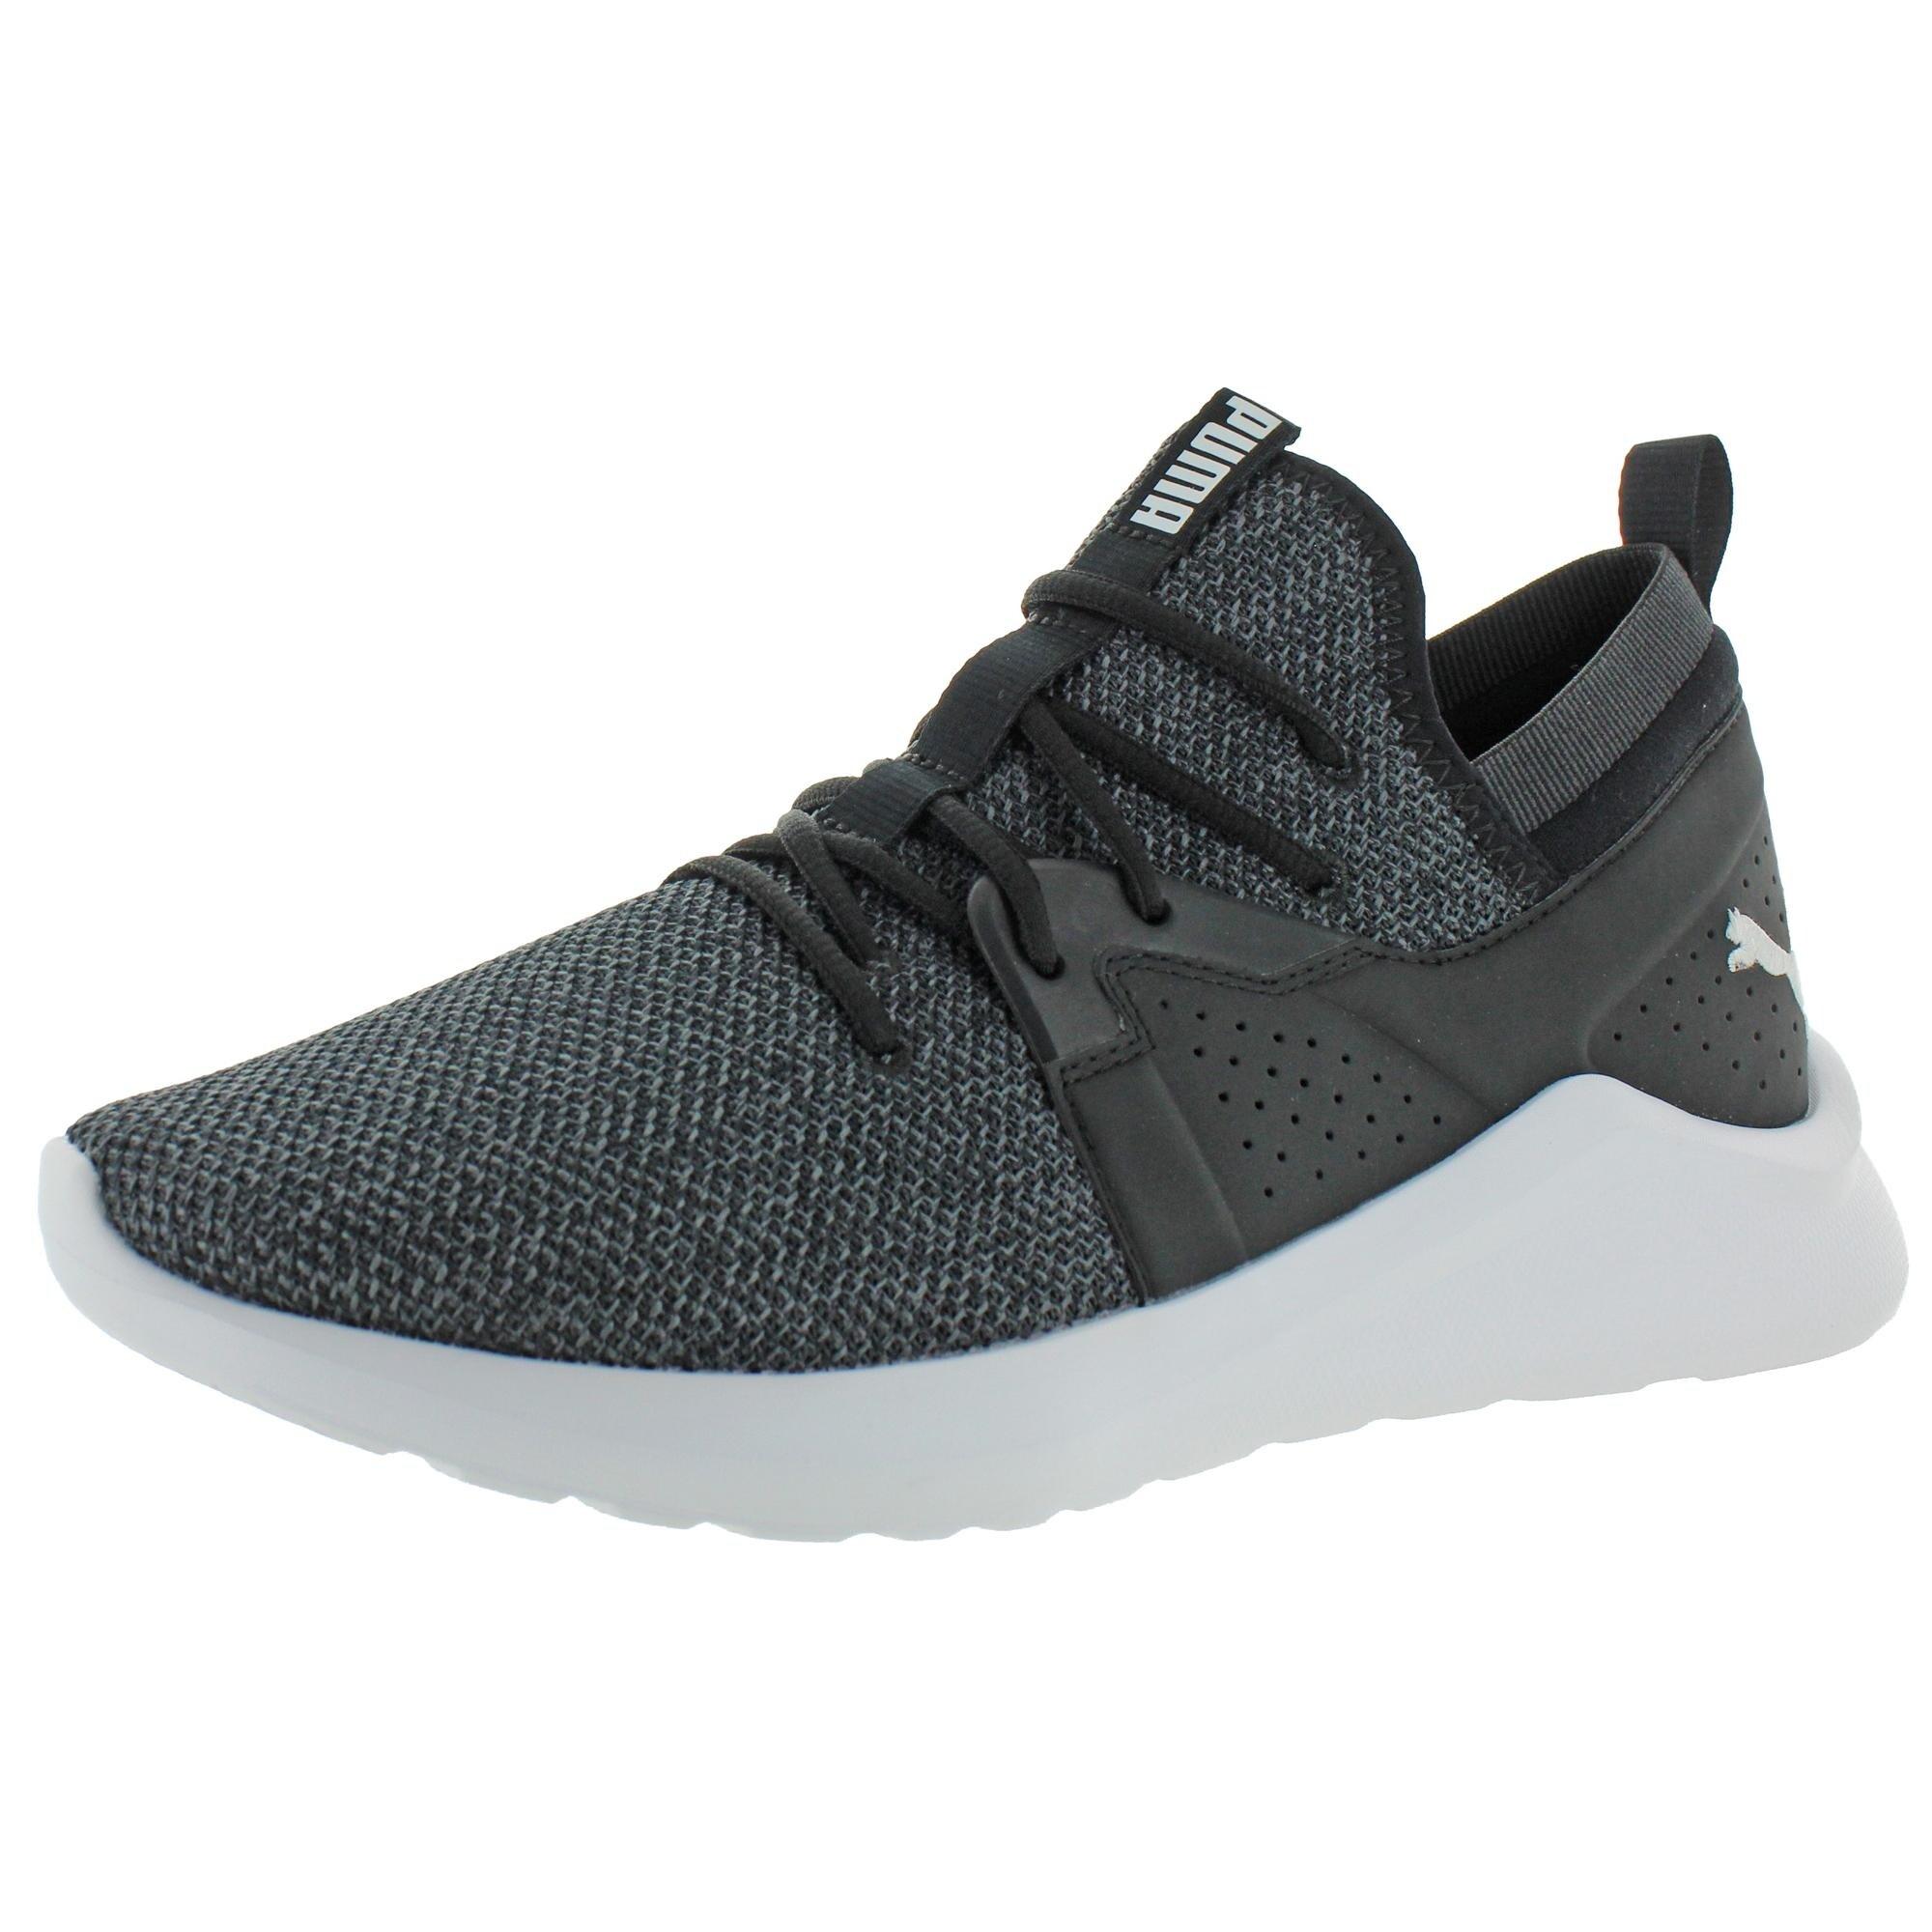 Shop Puma Mens Emergence Running Shoes